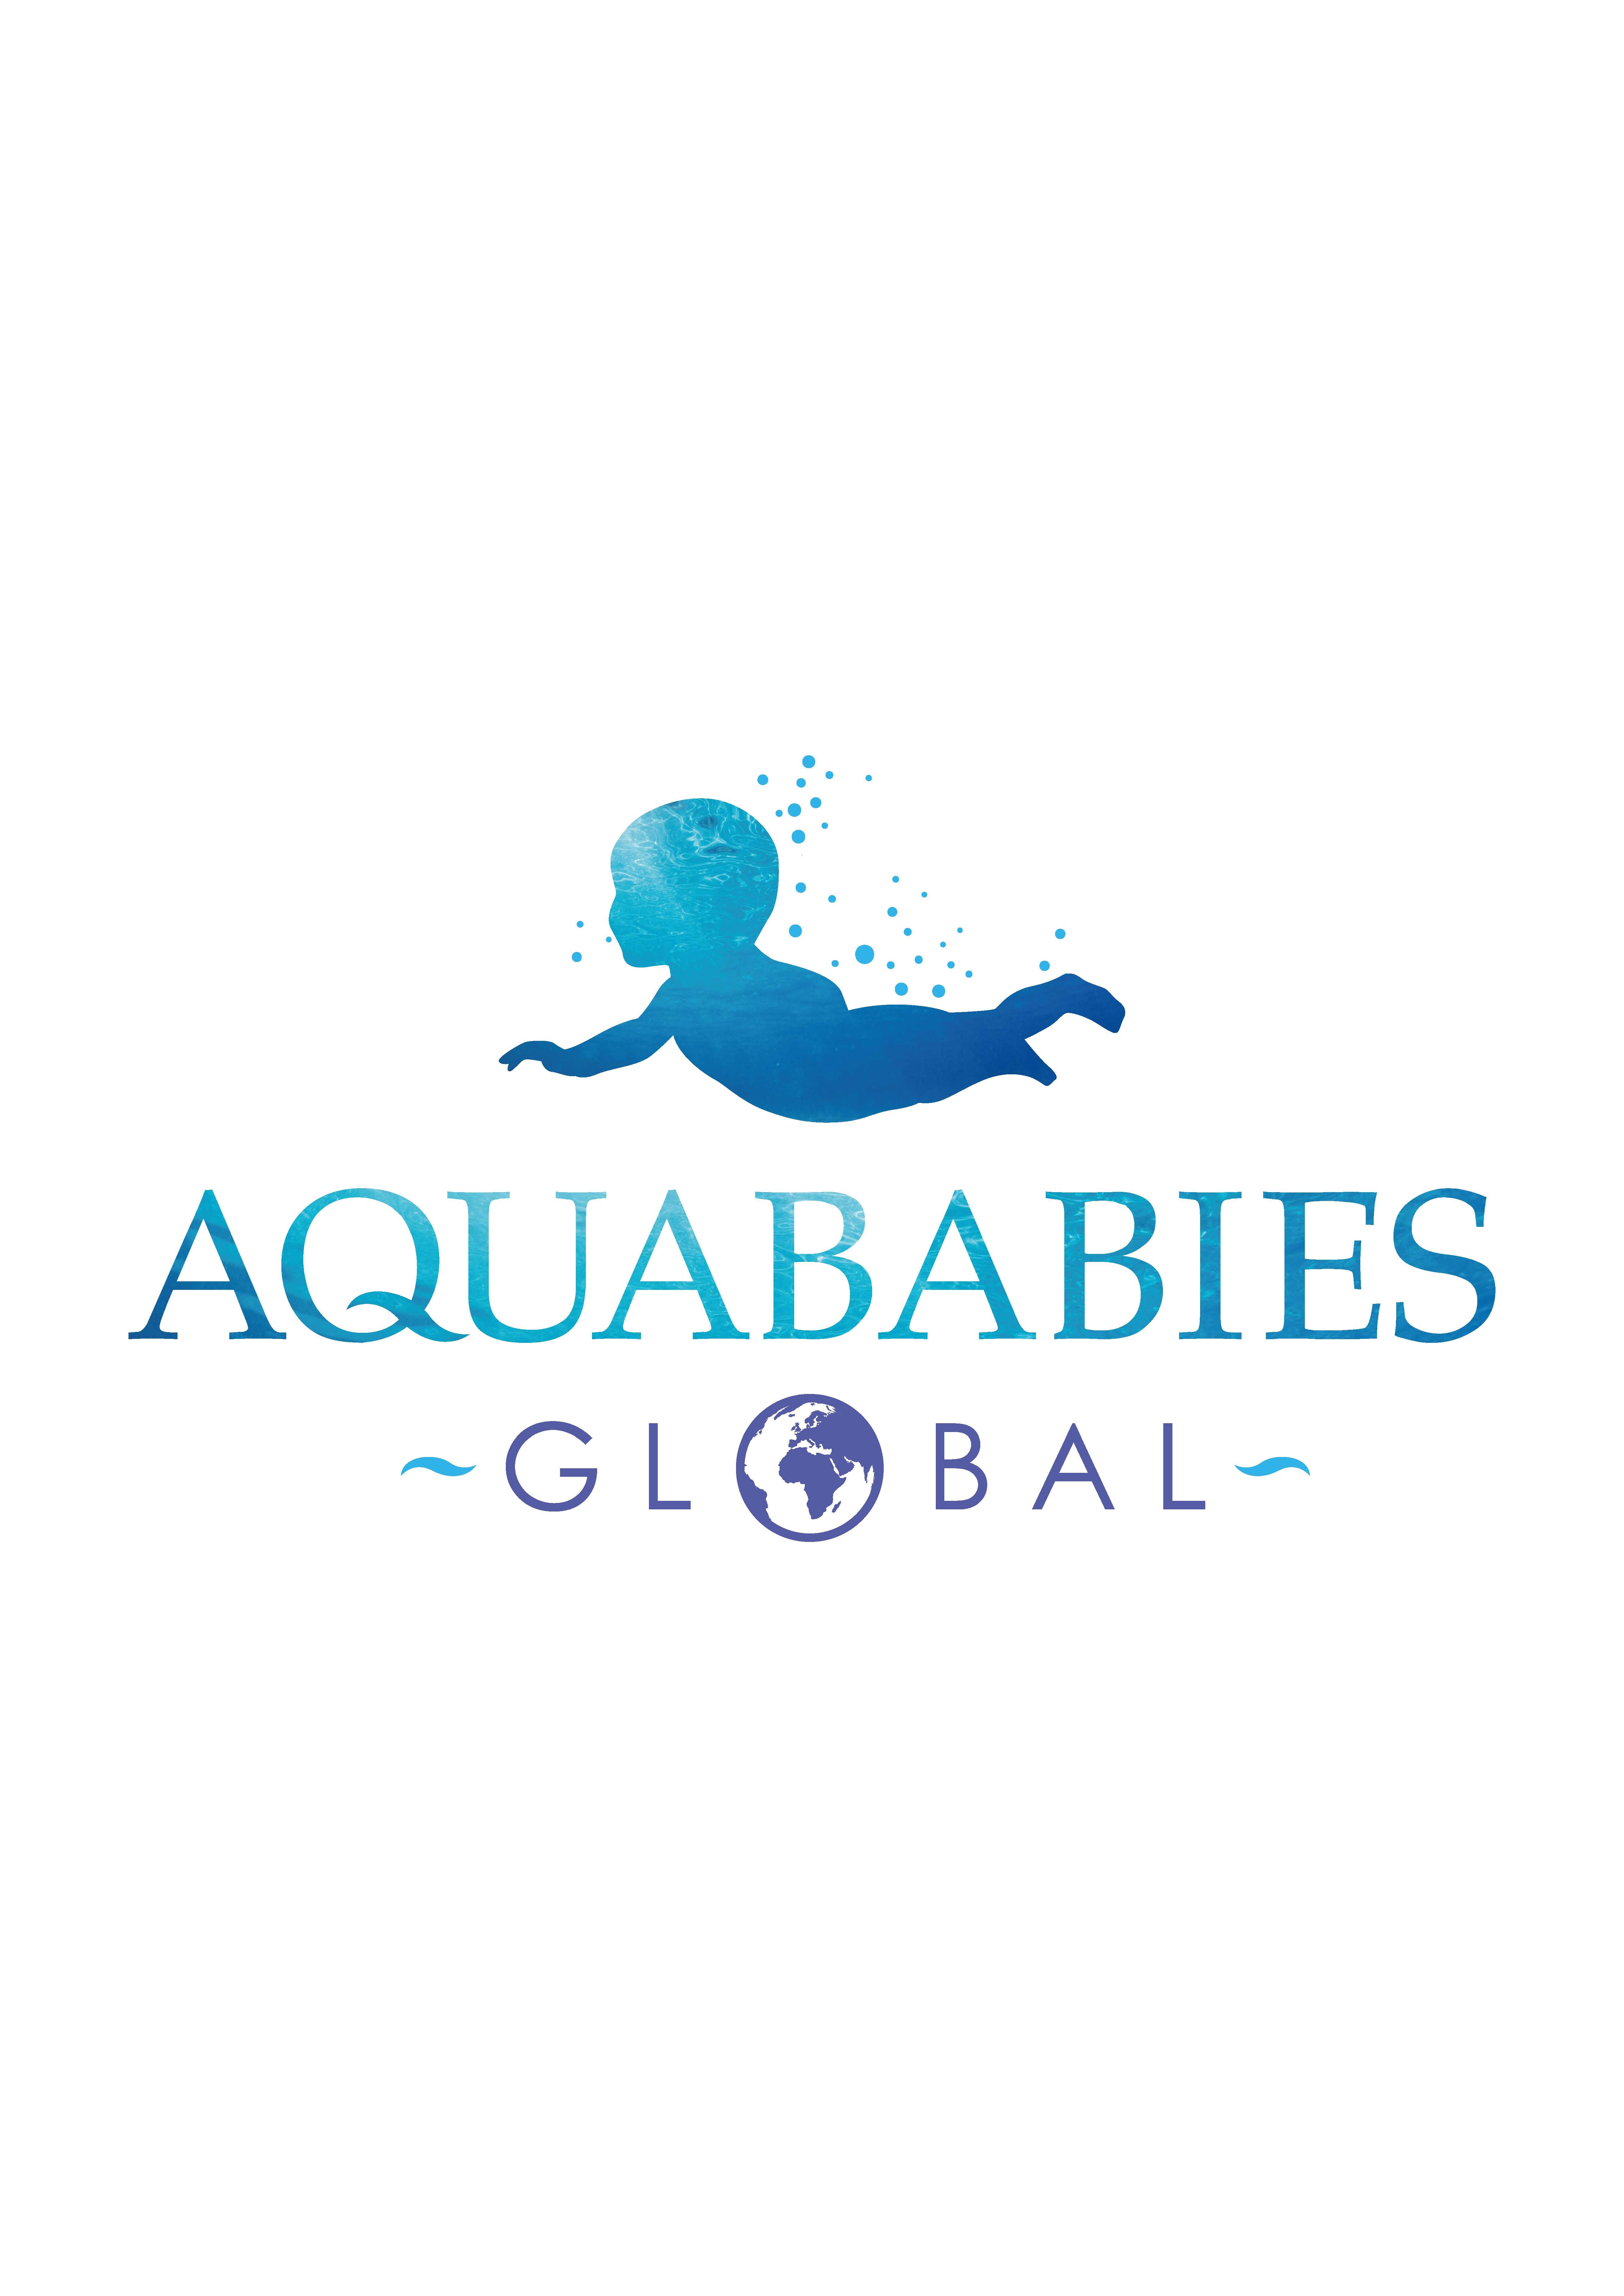 Aquababies -  World renowned swimming school